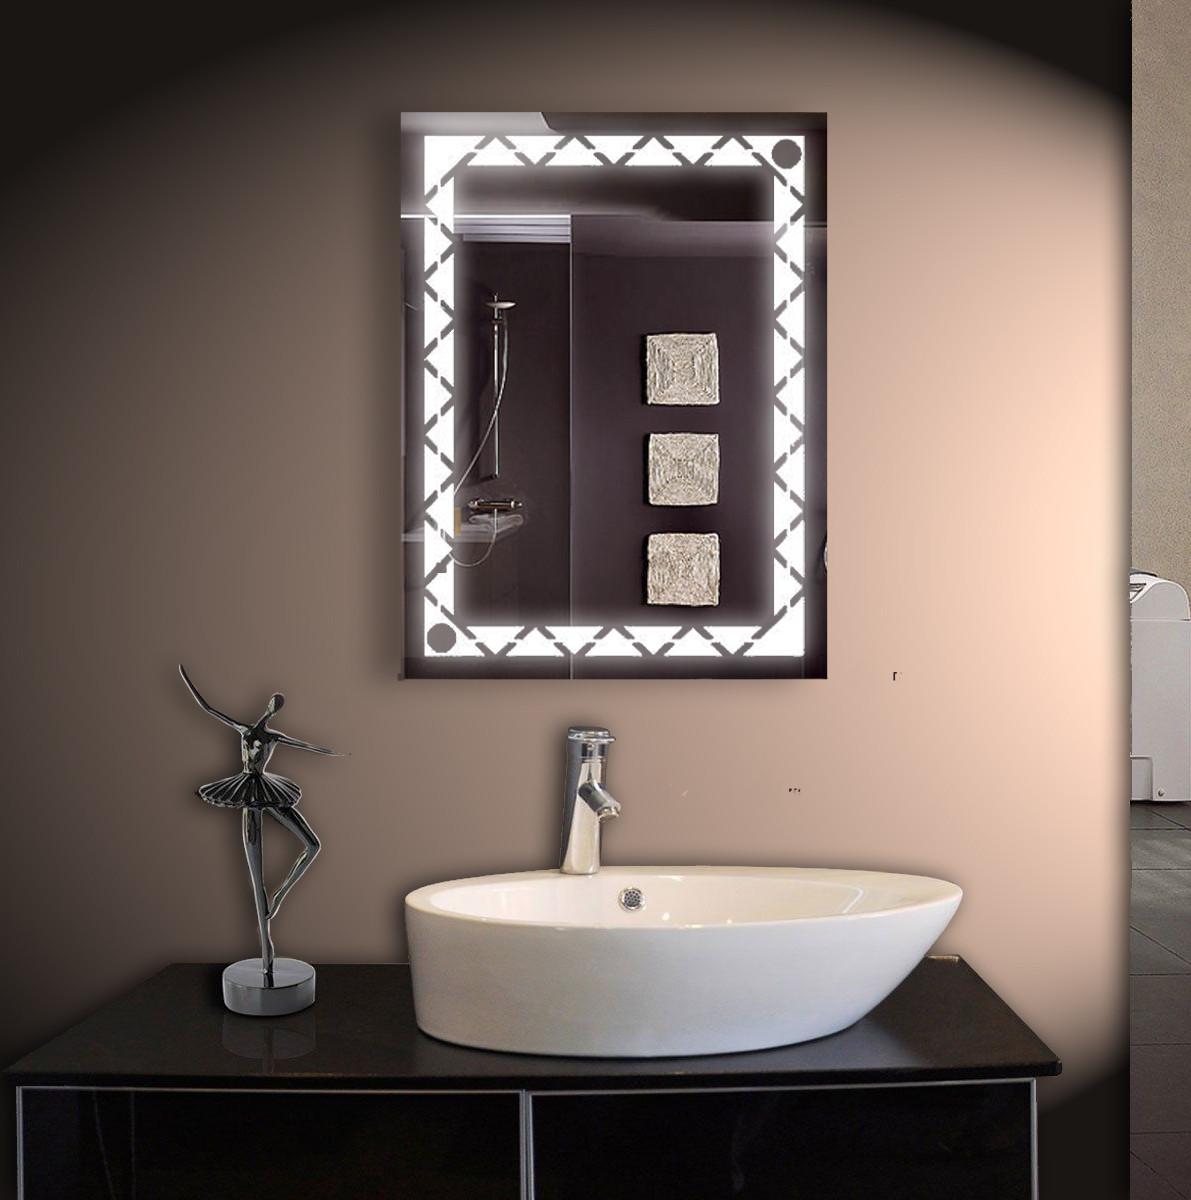 Зеркало LED со светодиодной подсветкой ver-3065 600х800 мм